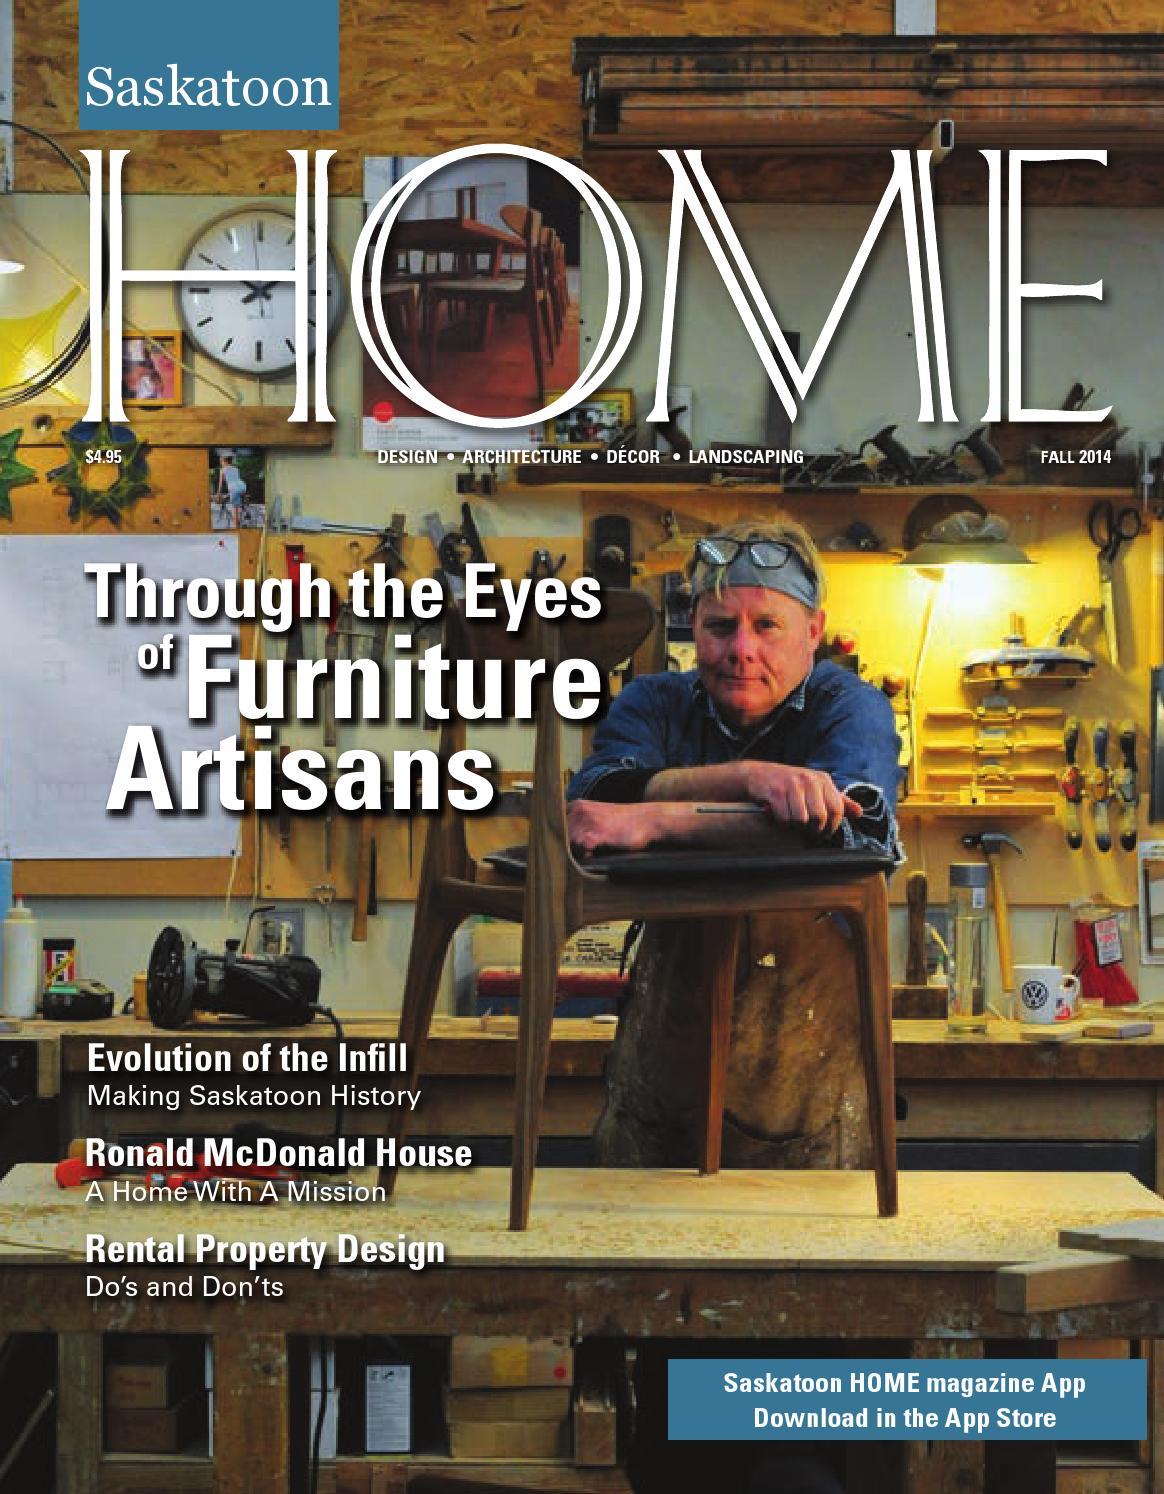 chair covers saskatoon crushed velvet uk home magazine fall 2014 by farmhouse